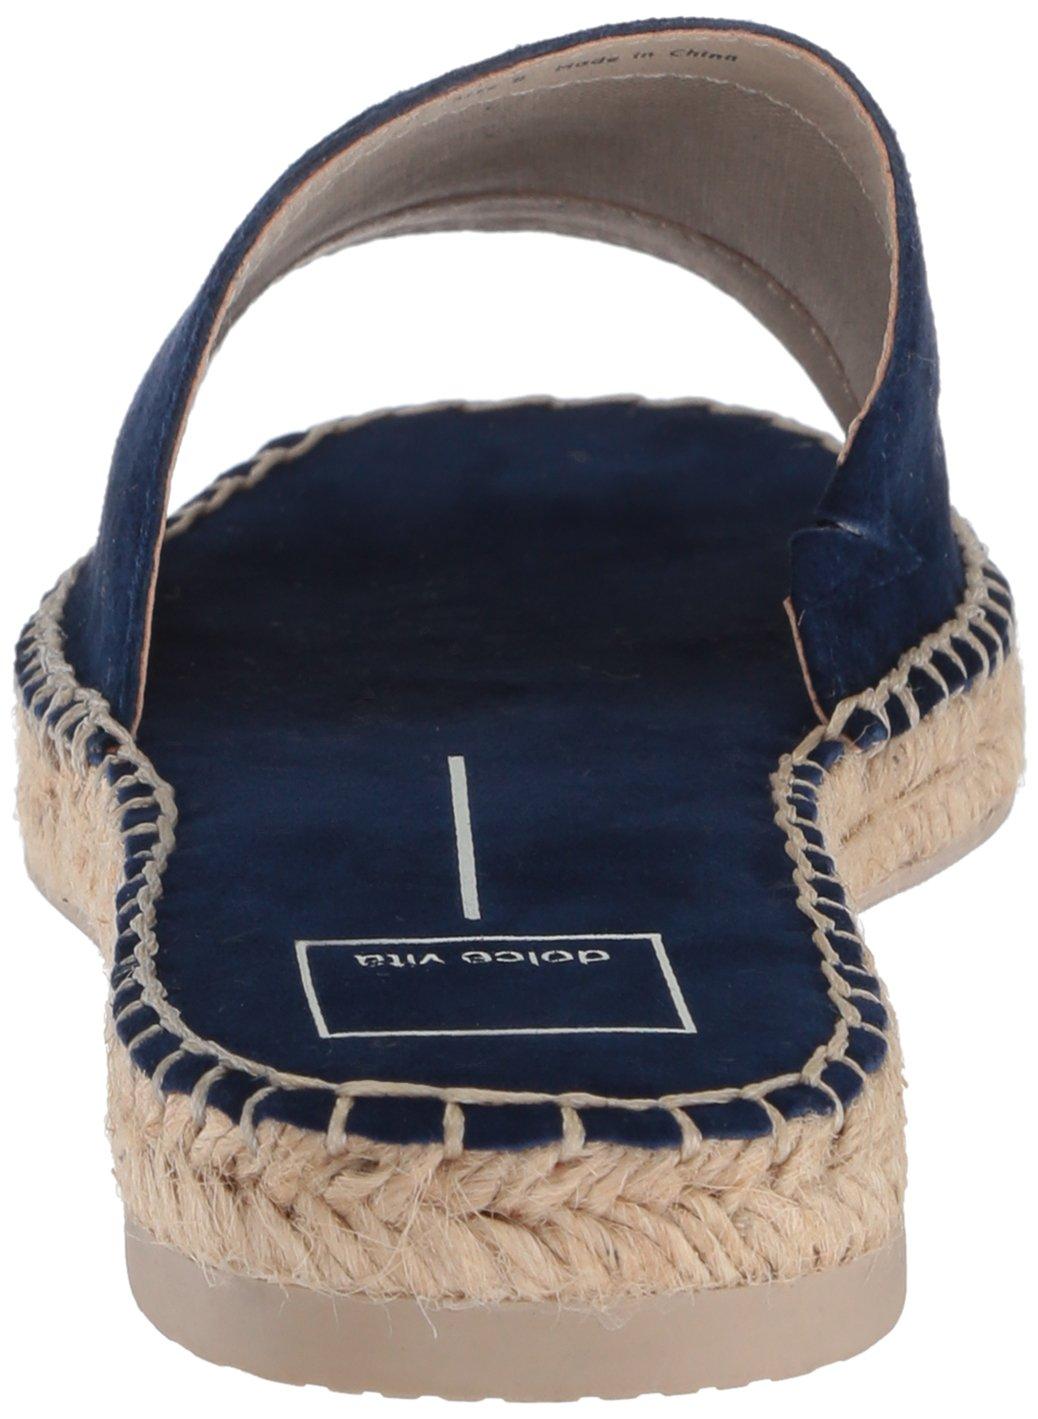 Dolce Vita Women's Bobbi Slide Sandal B077QTN1XC 9.5 B(M) US Navy Suede